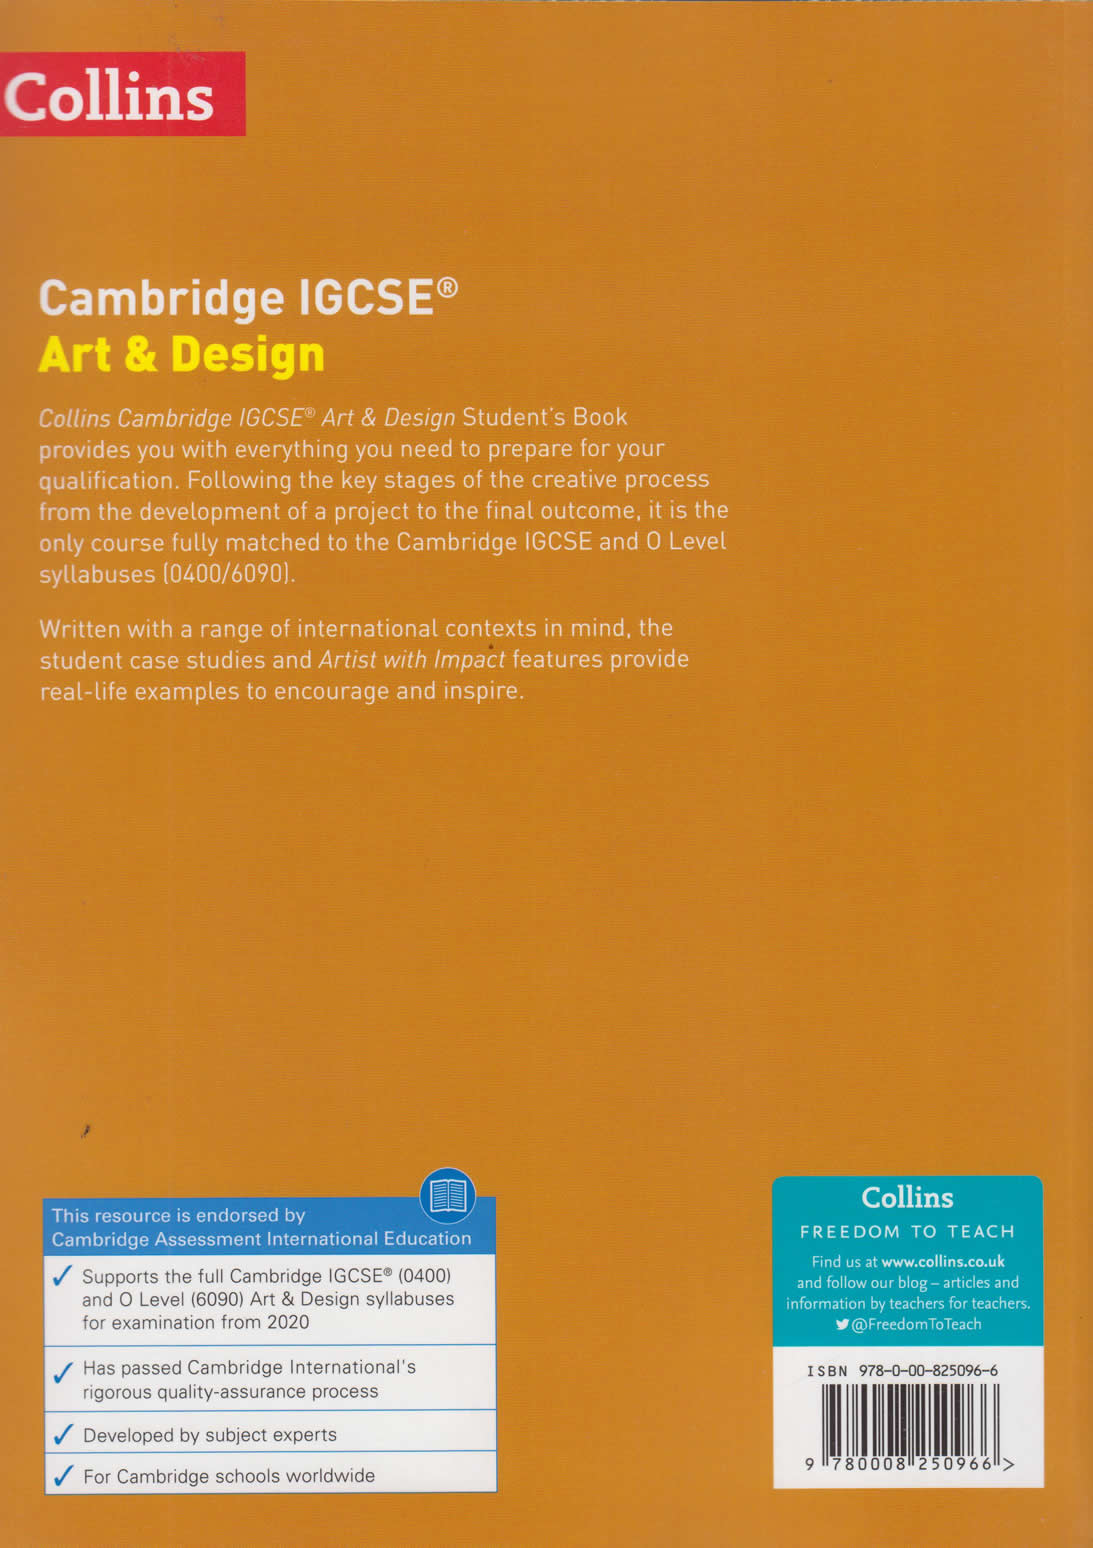 Cambridge IGCSE Art and Design Student's Book   Text Book Centre